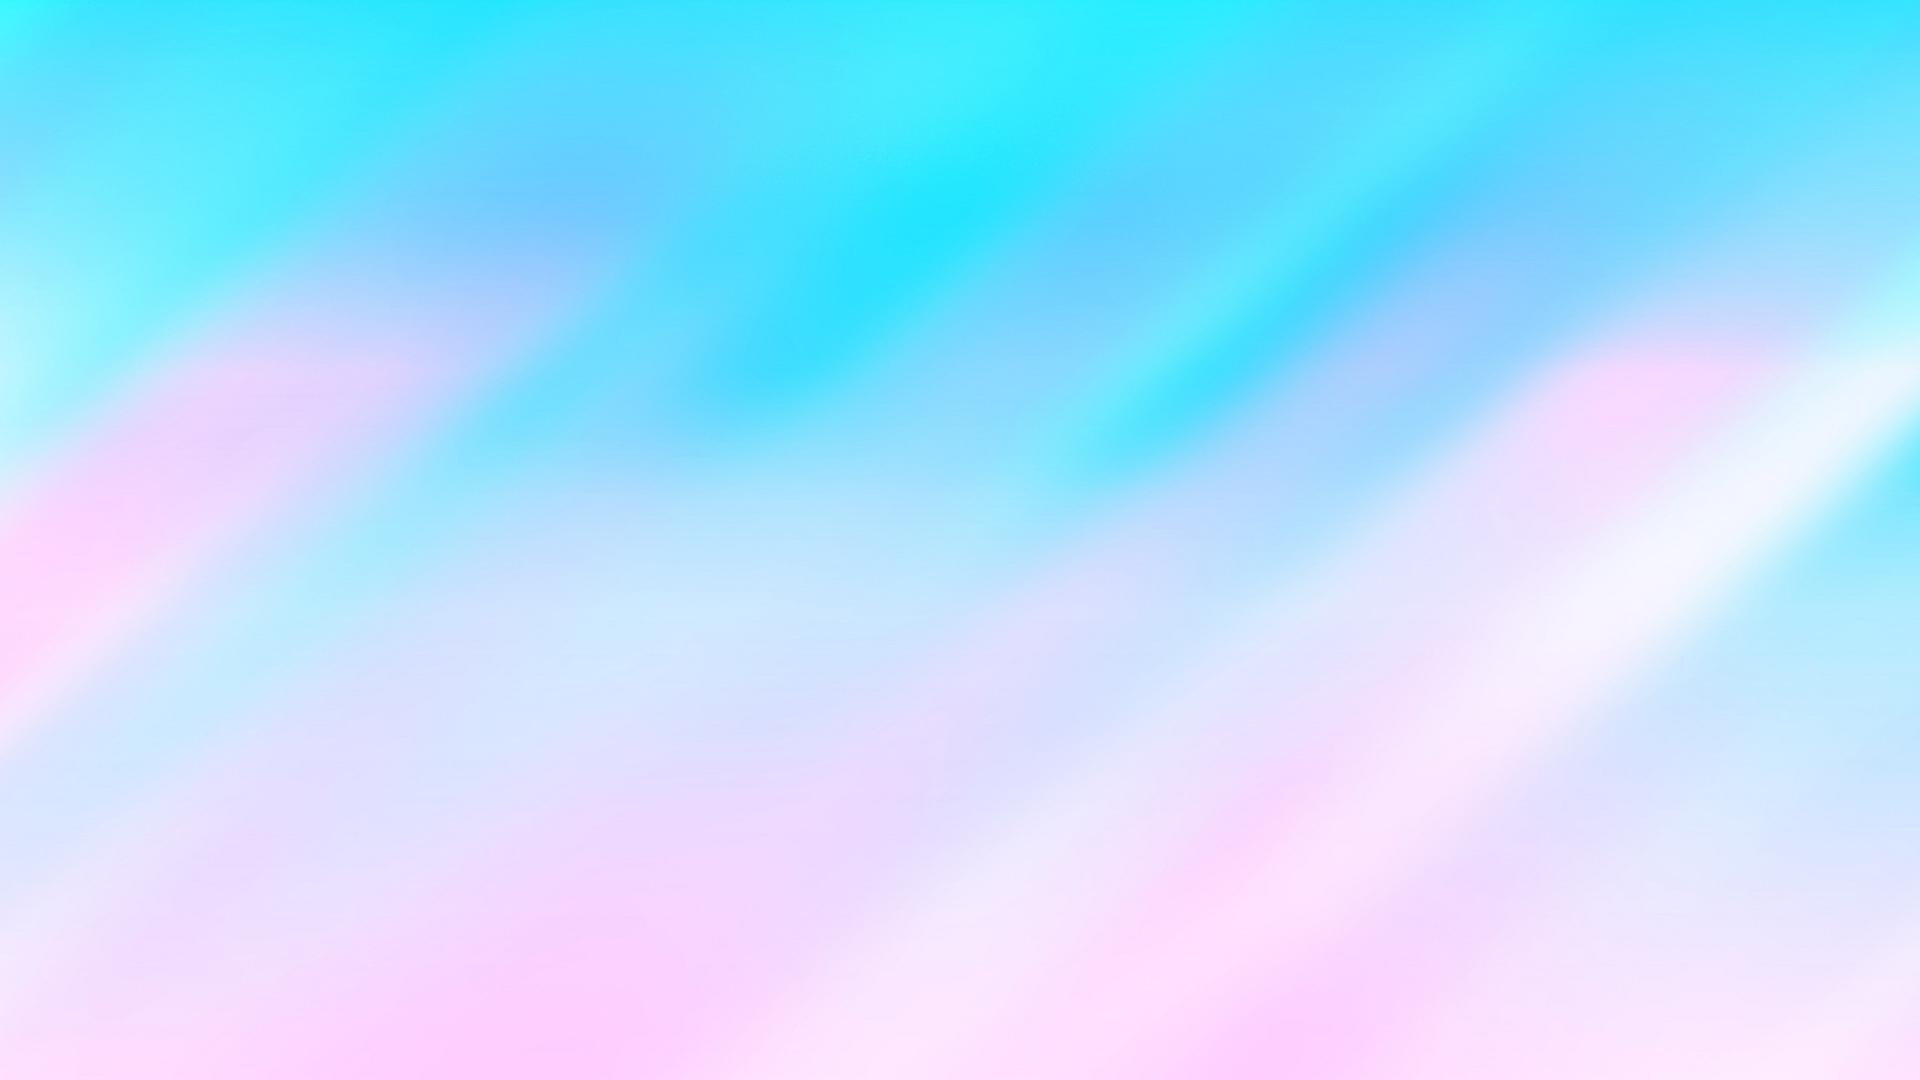 Artistic Computer Wallpapers Desktop Backgrounds 1920x1080 ID 1920x1080